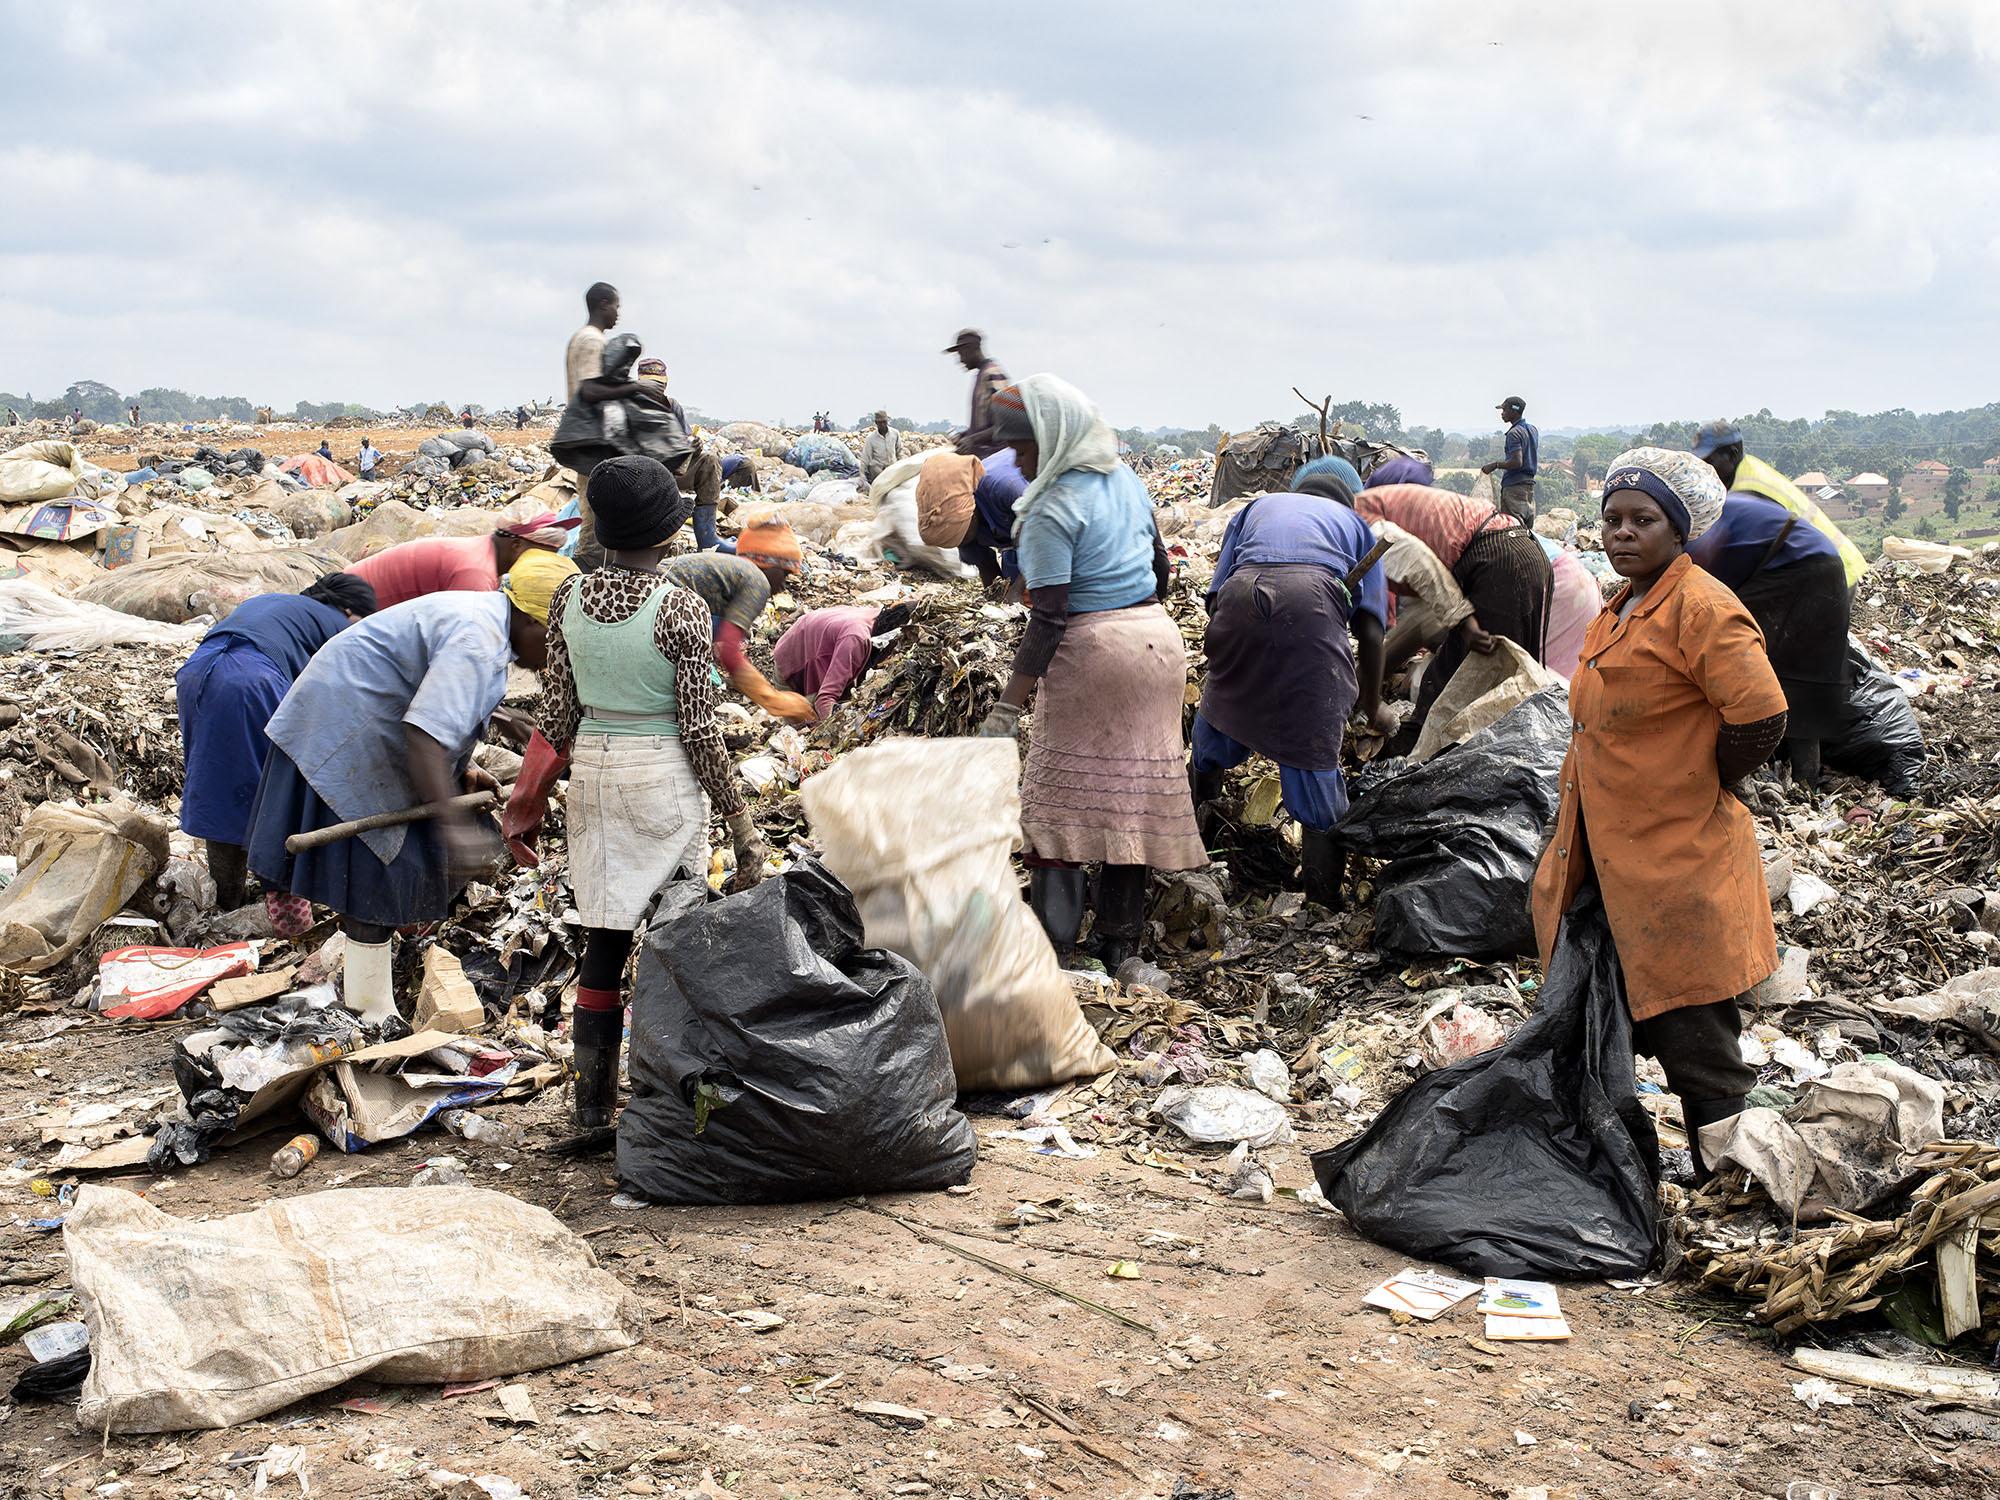 Lena Dobrowolska & Teo Ormond-Skeaping, Kiteezi Municipal Waste Site - Kampala, Uganda